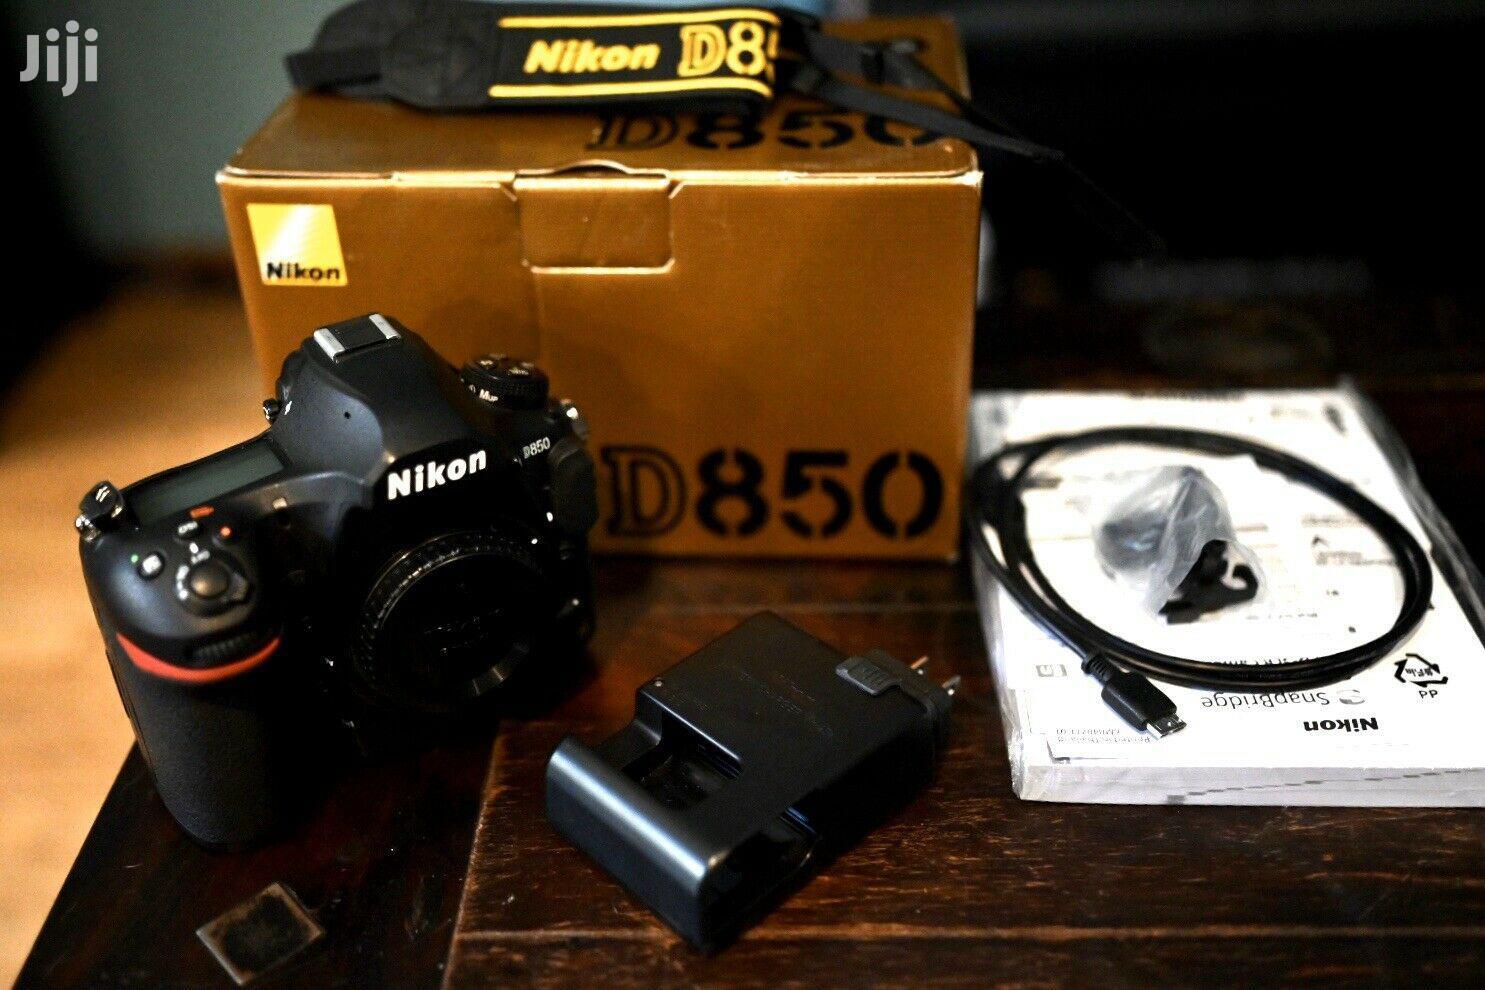 Archive: Nikon D850 45.7MP Digital SLR Camera - Black (Body Only)